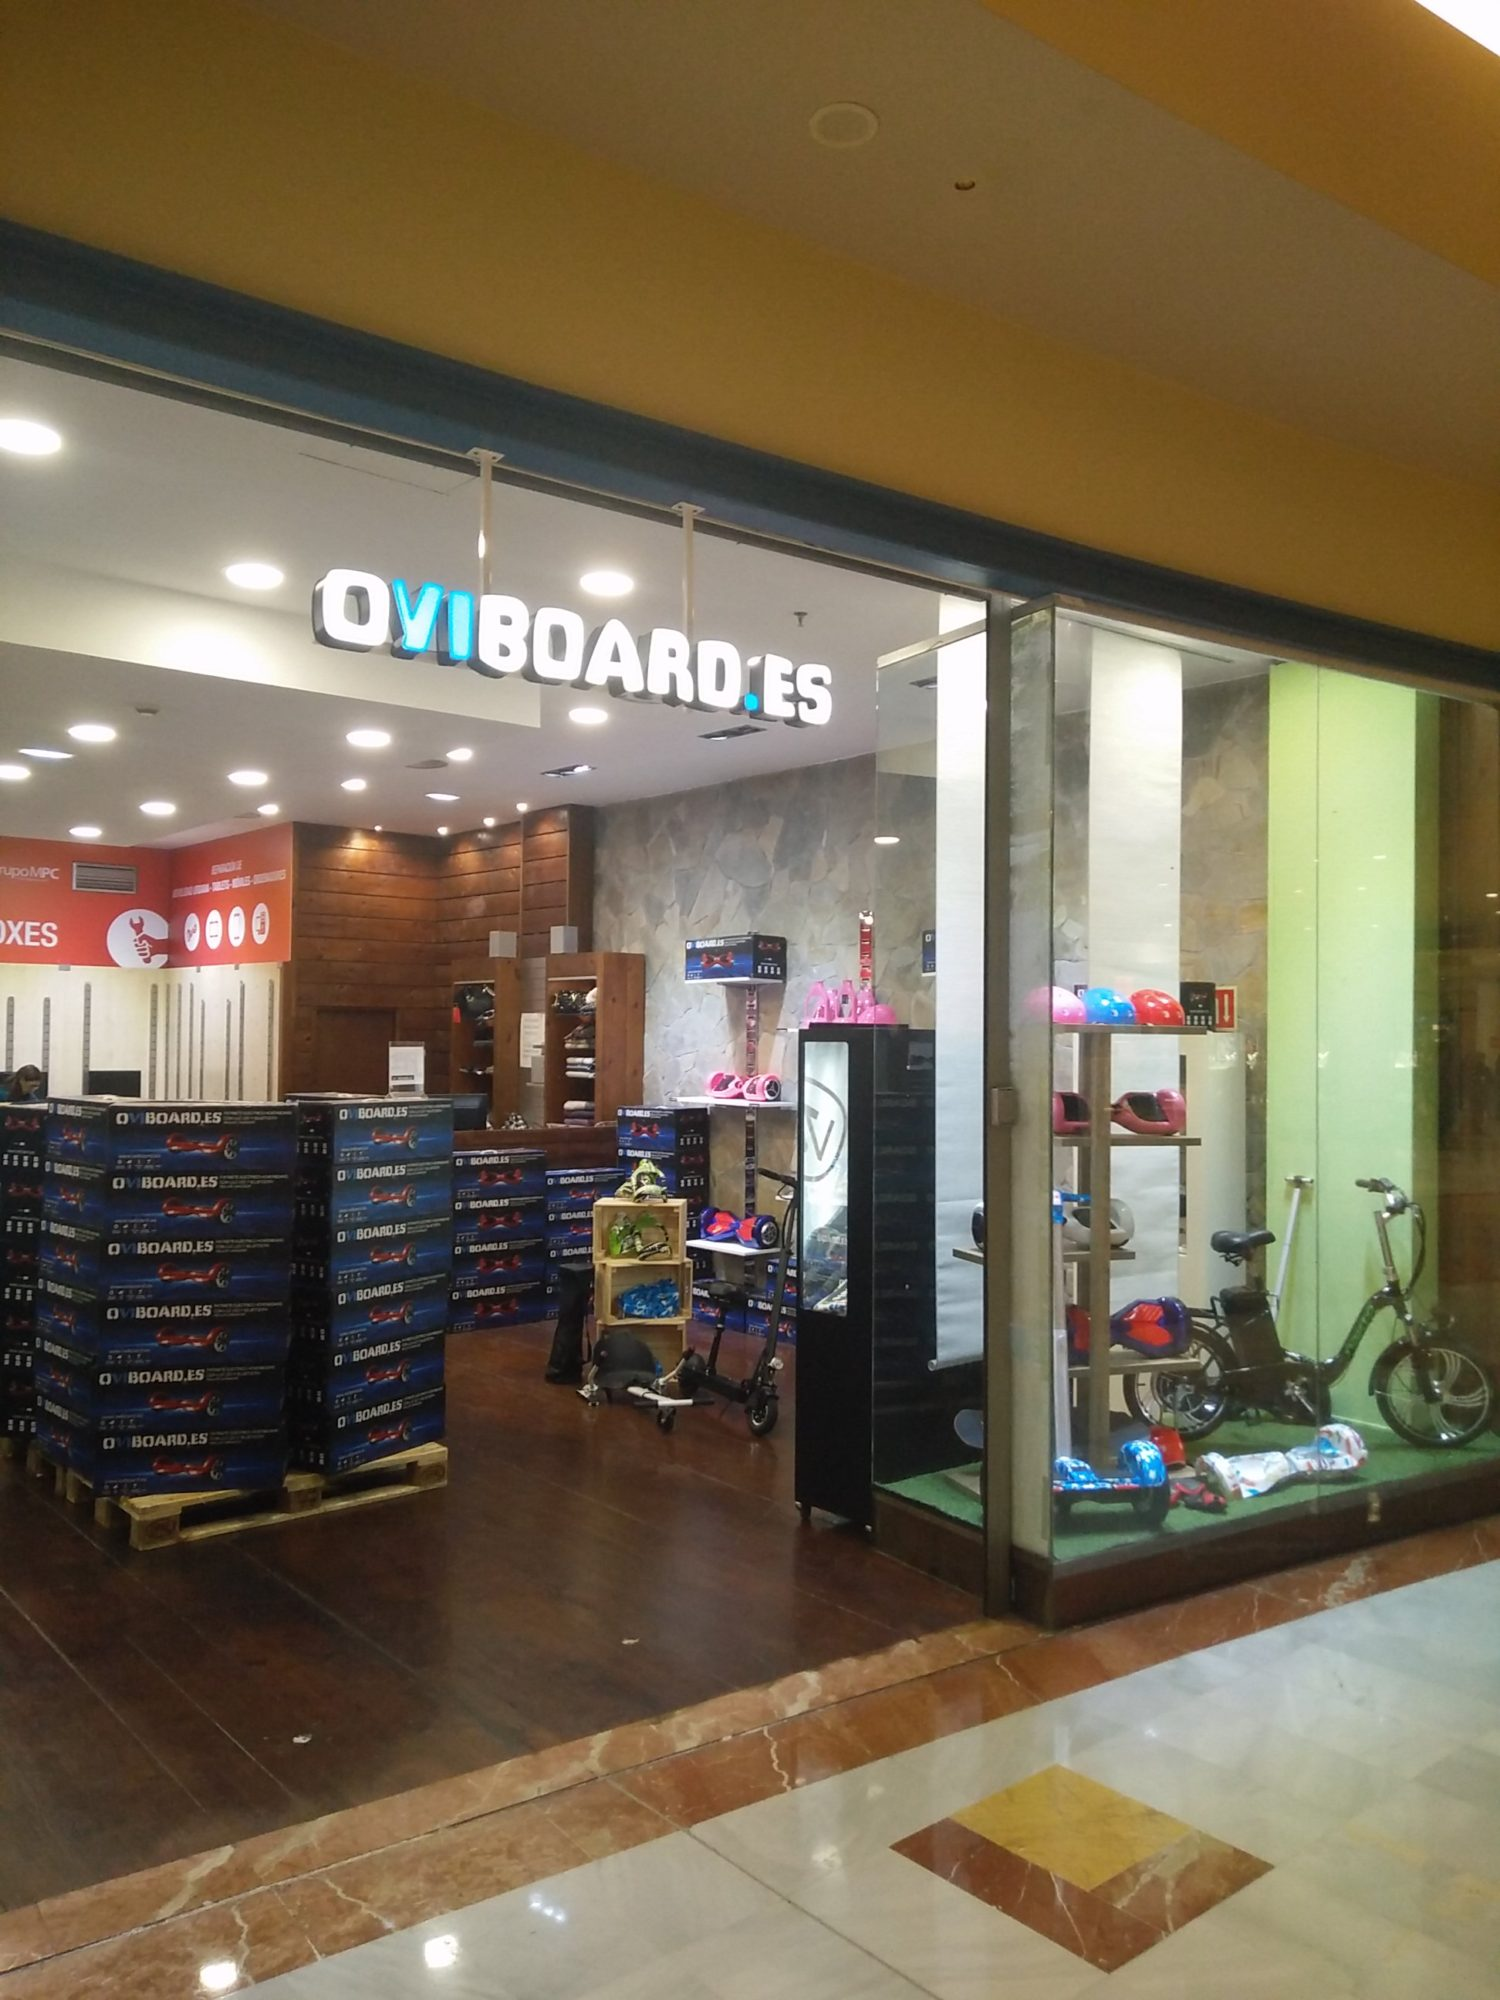 d1d8ae716f Inauguramos Tienda Oficial De Oviboard.es - Oviboard.es